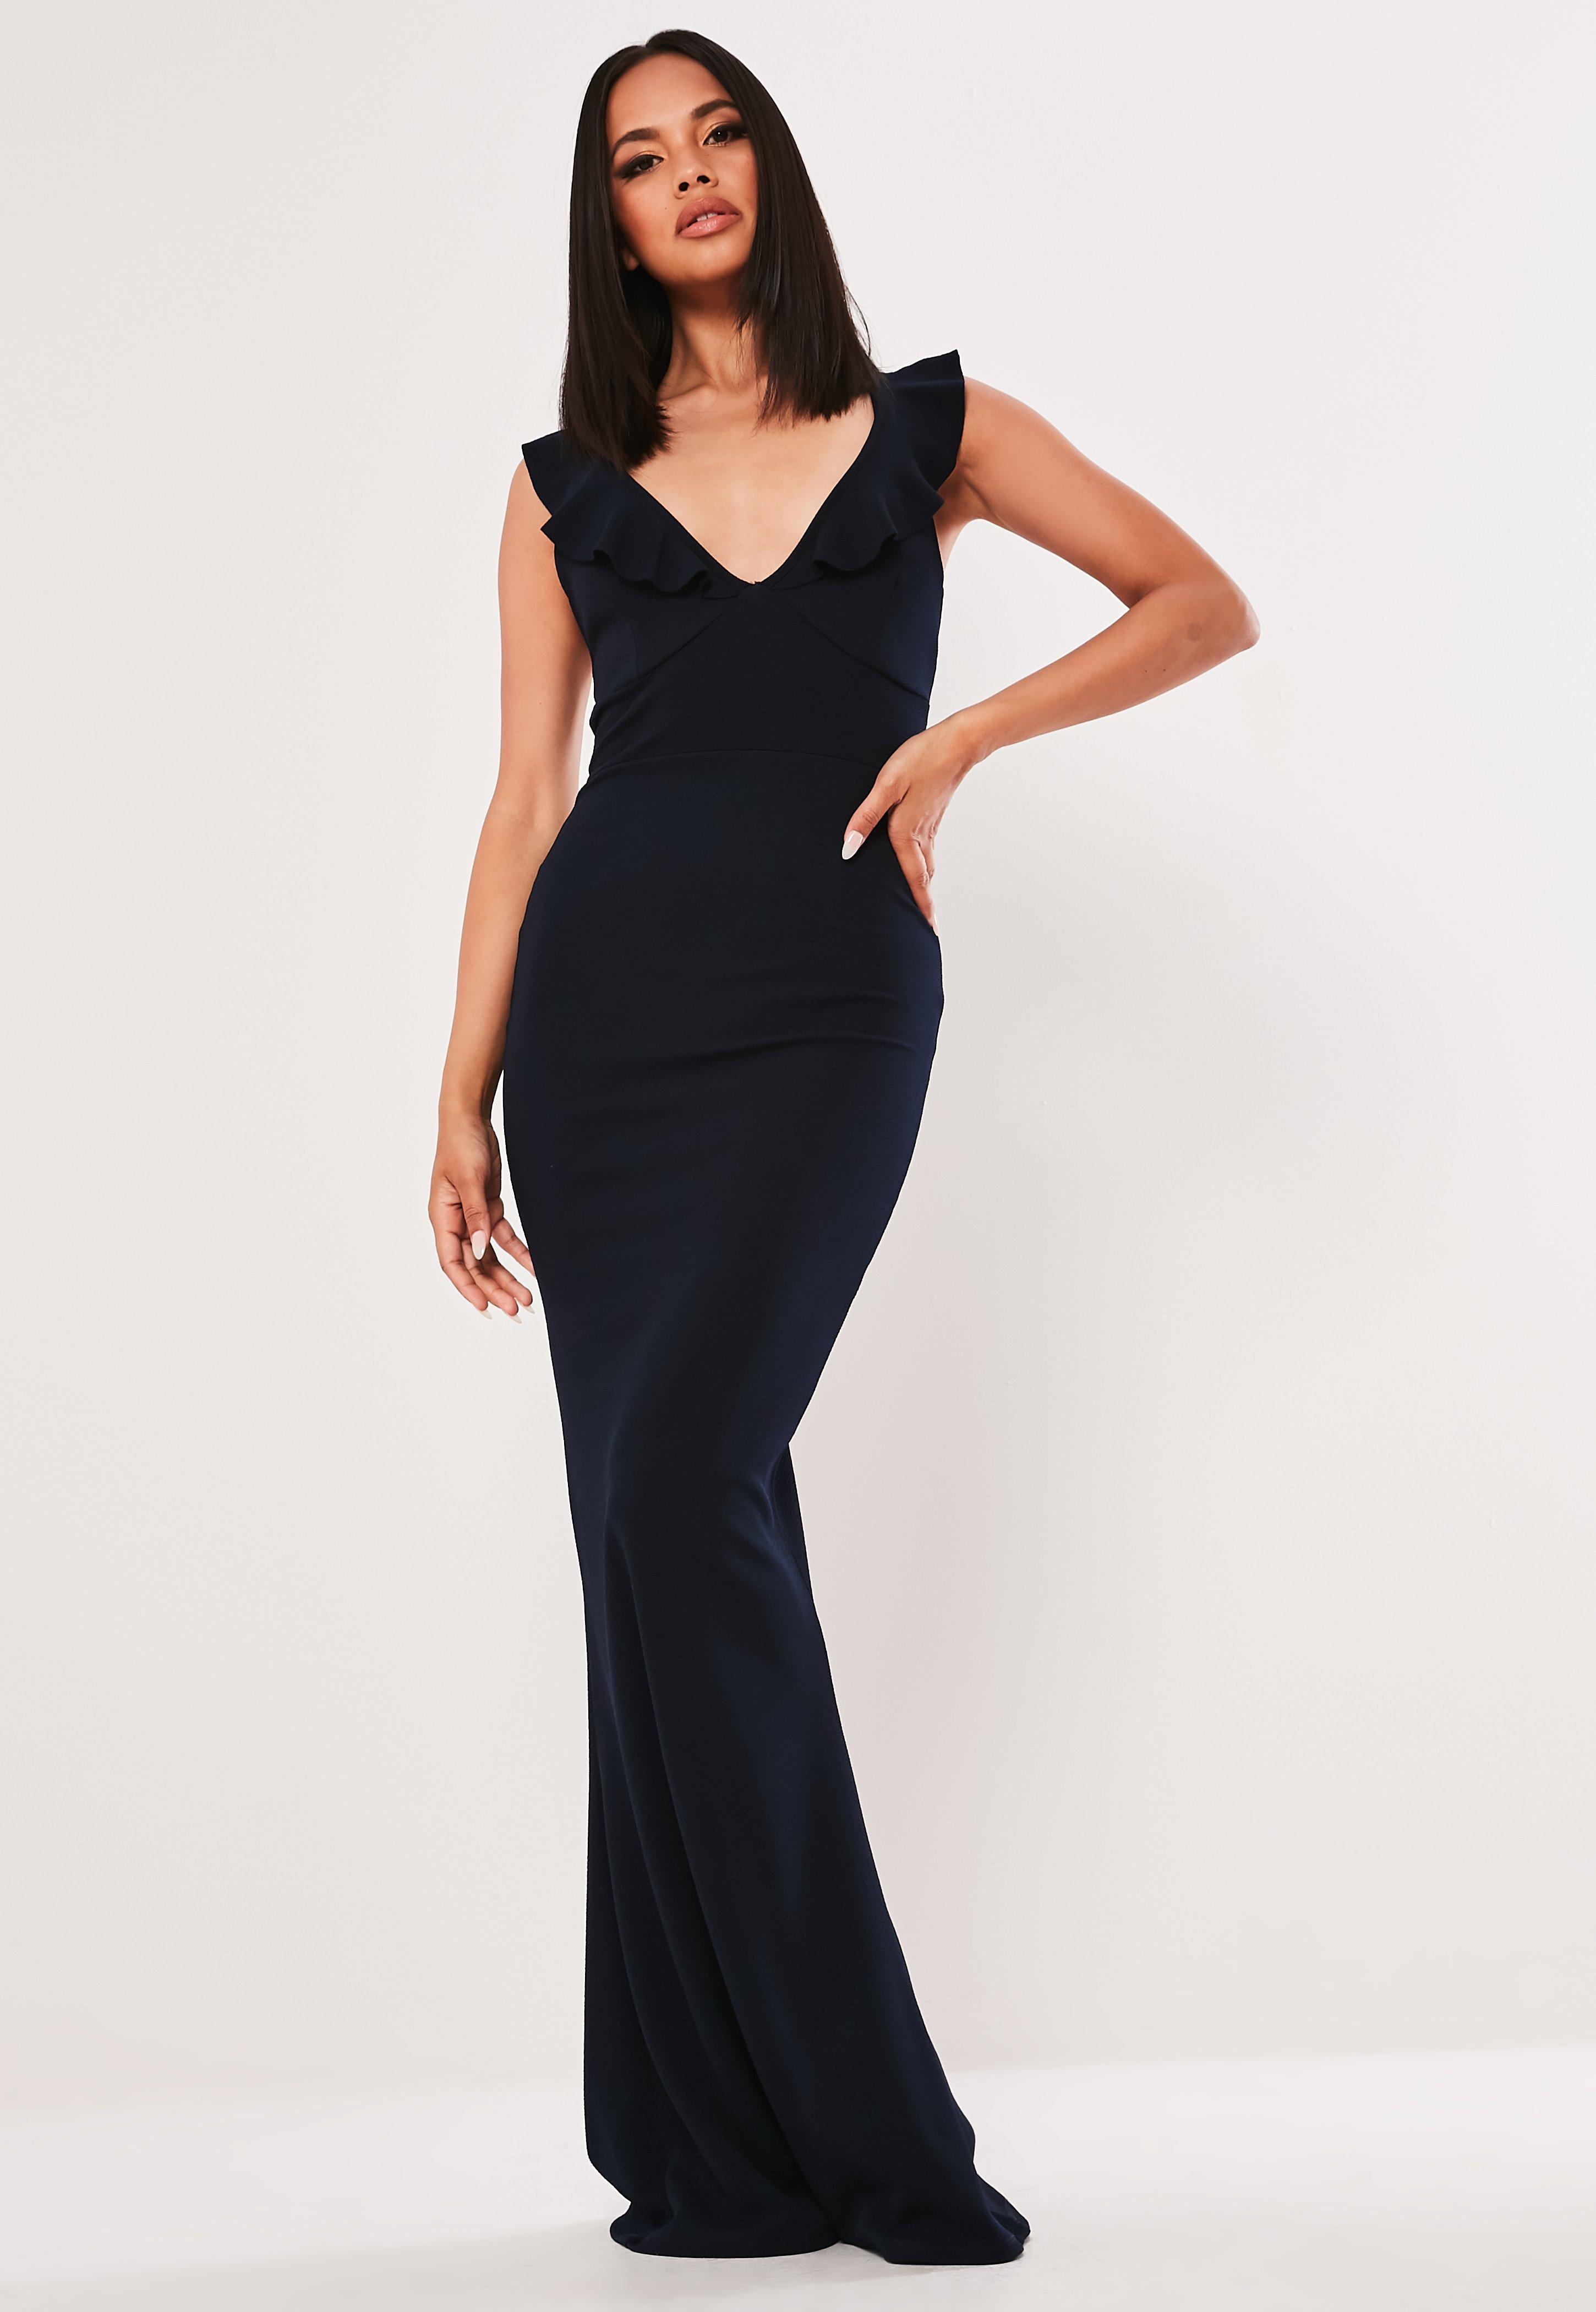 c4d97ca543e7 Prom Dresses